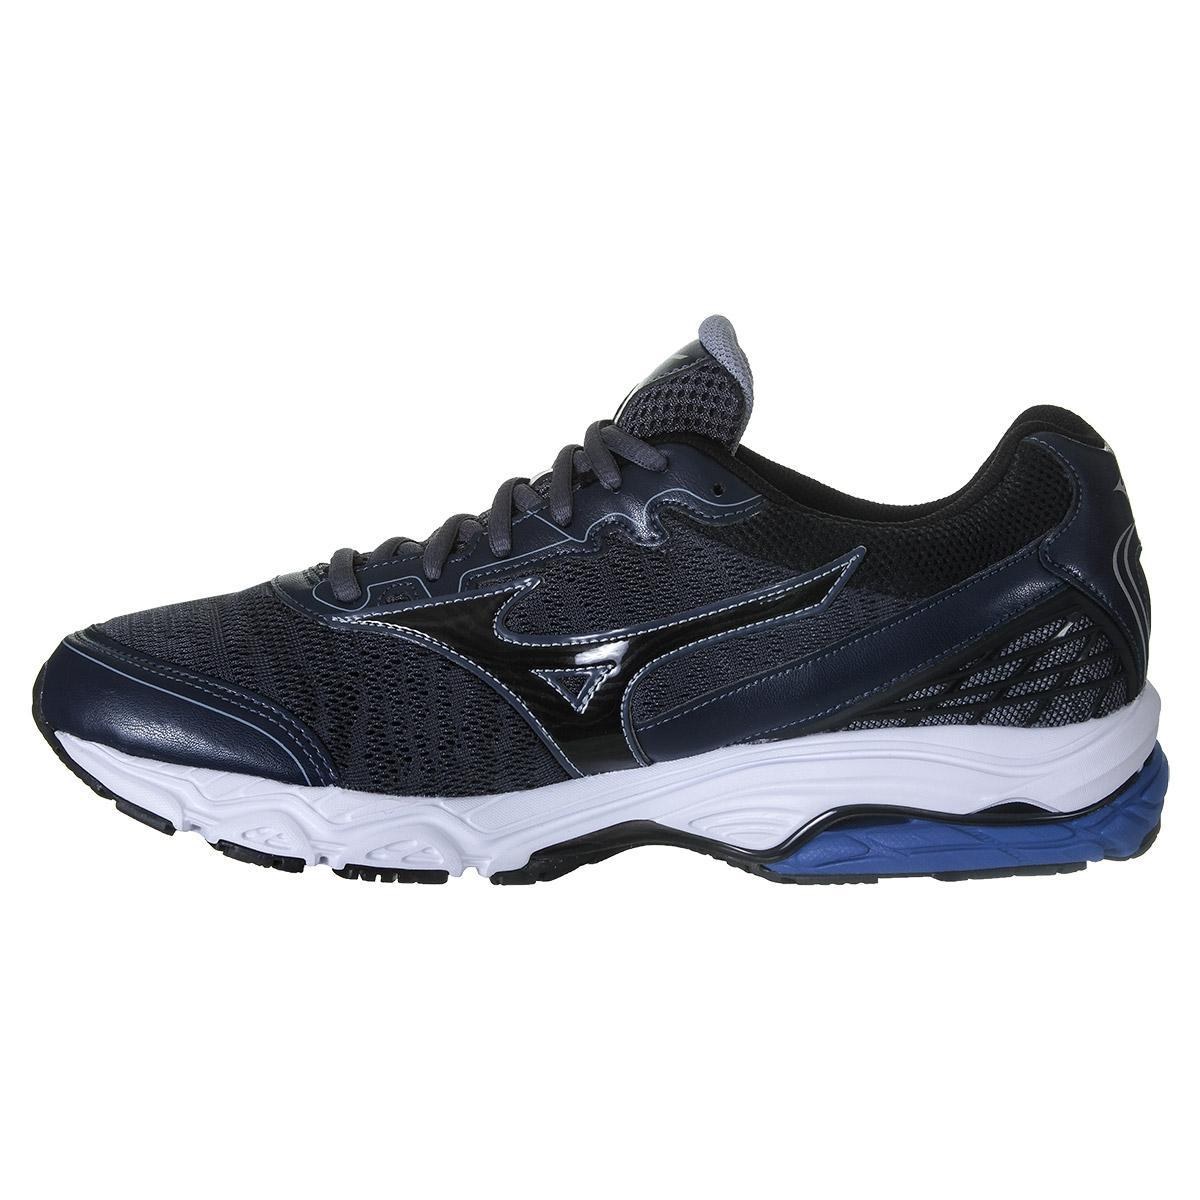 47d364576ee Tênis Mizuno Wave Mirai Masculino Corrida - Caminhada - Tênis de ...